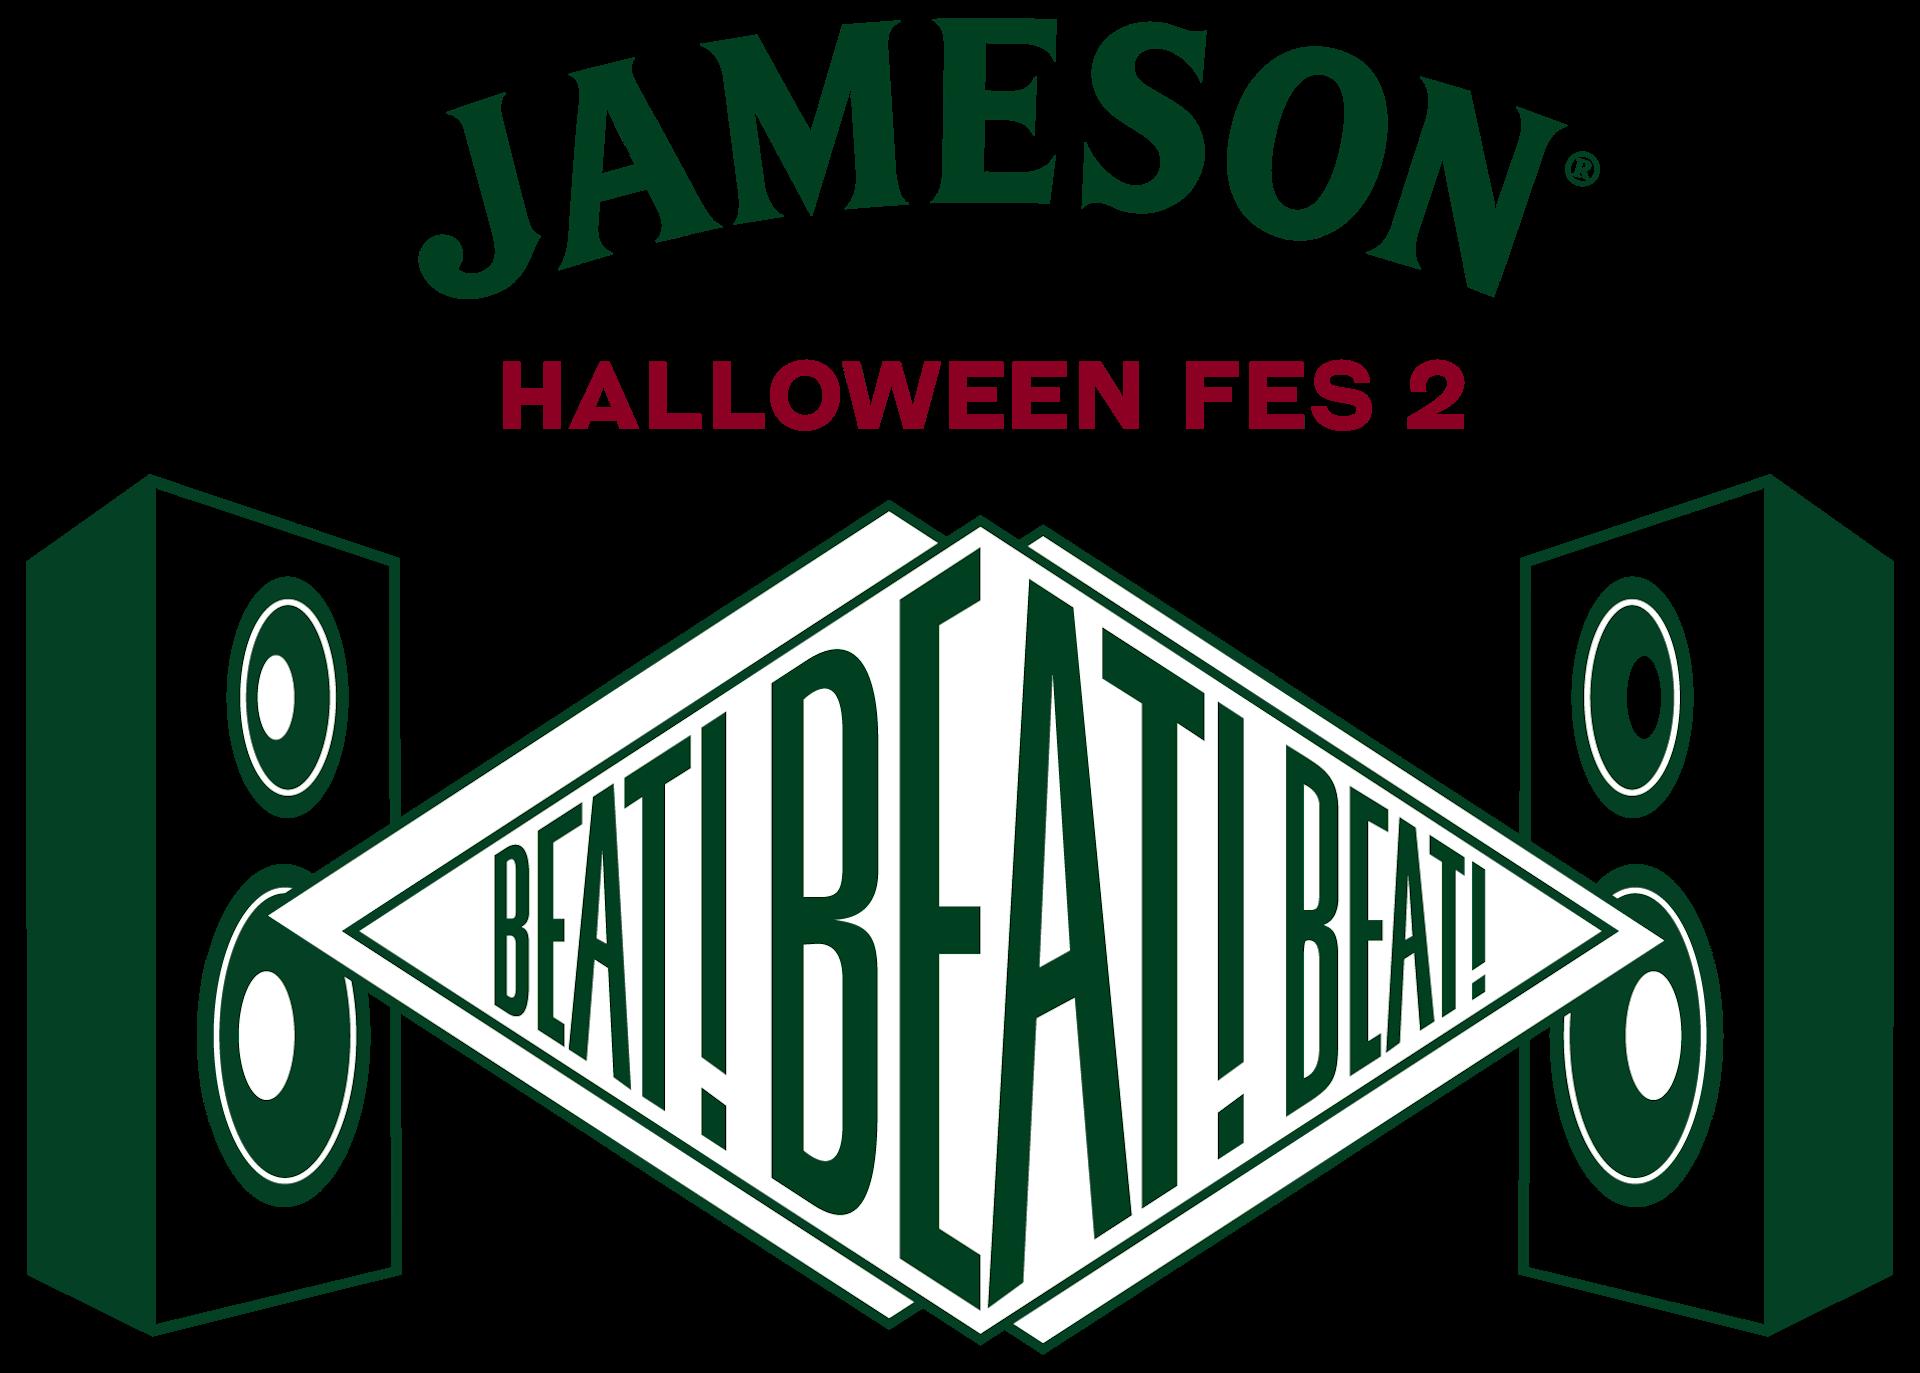 JAMESON×グッドモーニングアメリカ|金廣真悟が語る、お酒と音楽の関係性と<JAMESON HALLOWEEN FES 2>に向けて JHF2_Logo_4c